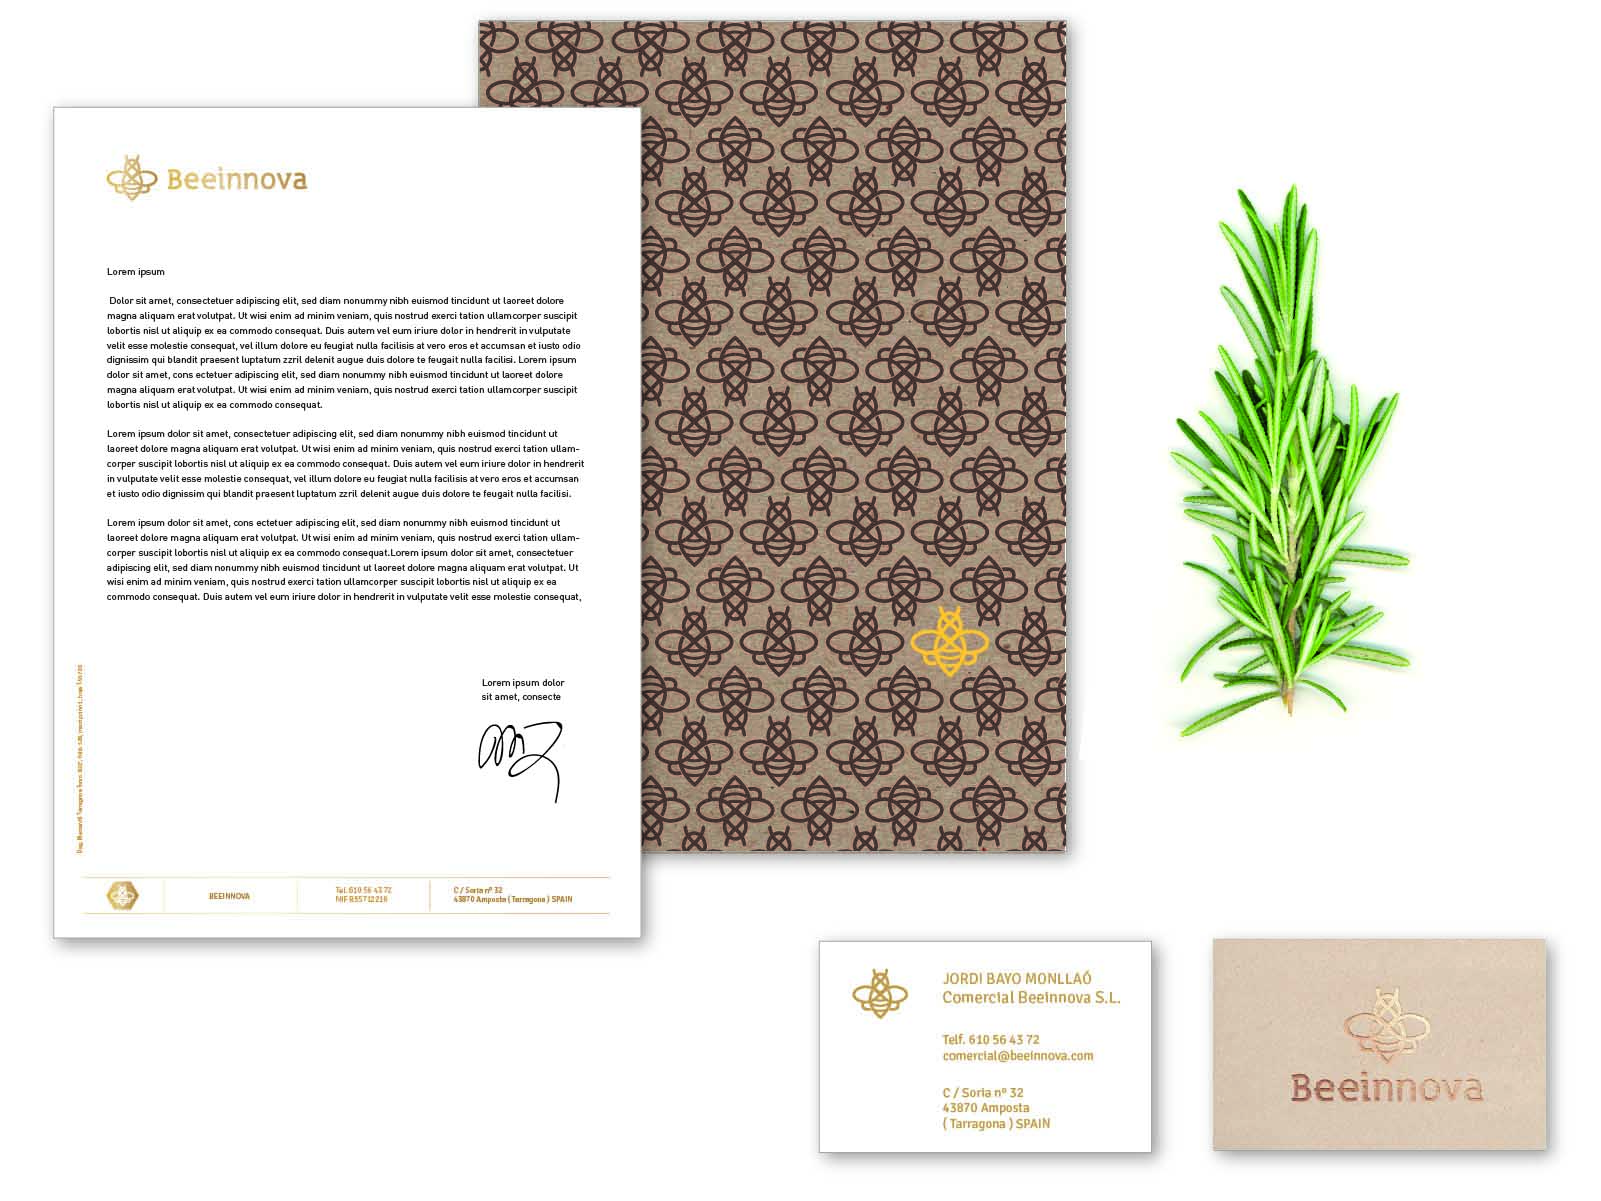 branding beeinnova, hoja de carta, papelería corporativa, tarjetas de visita, identidad visual